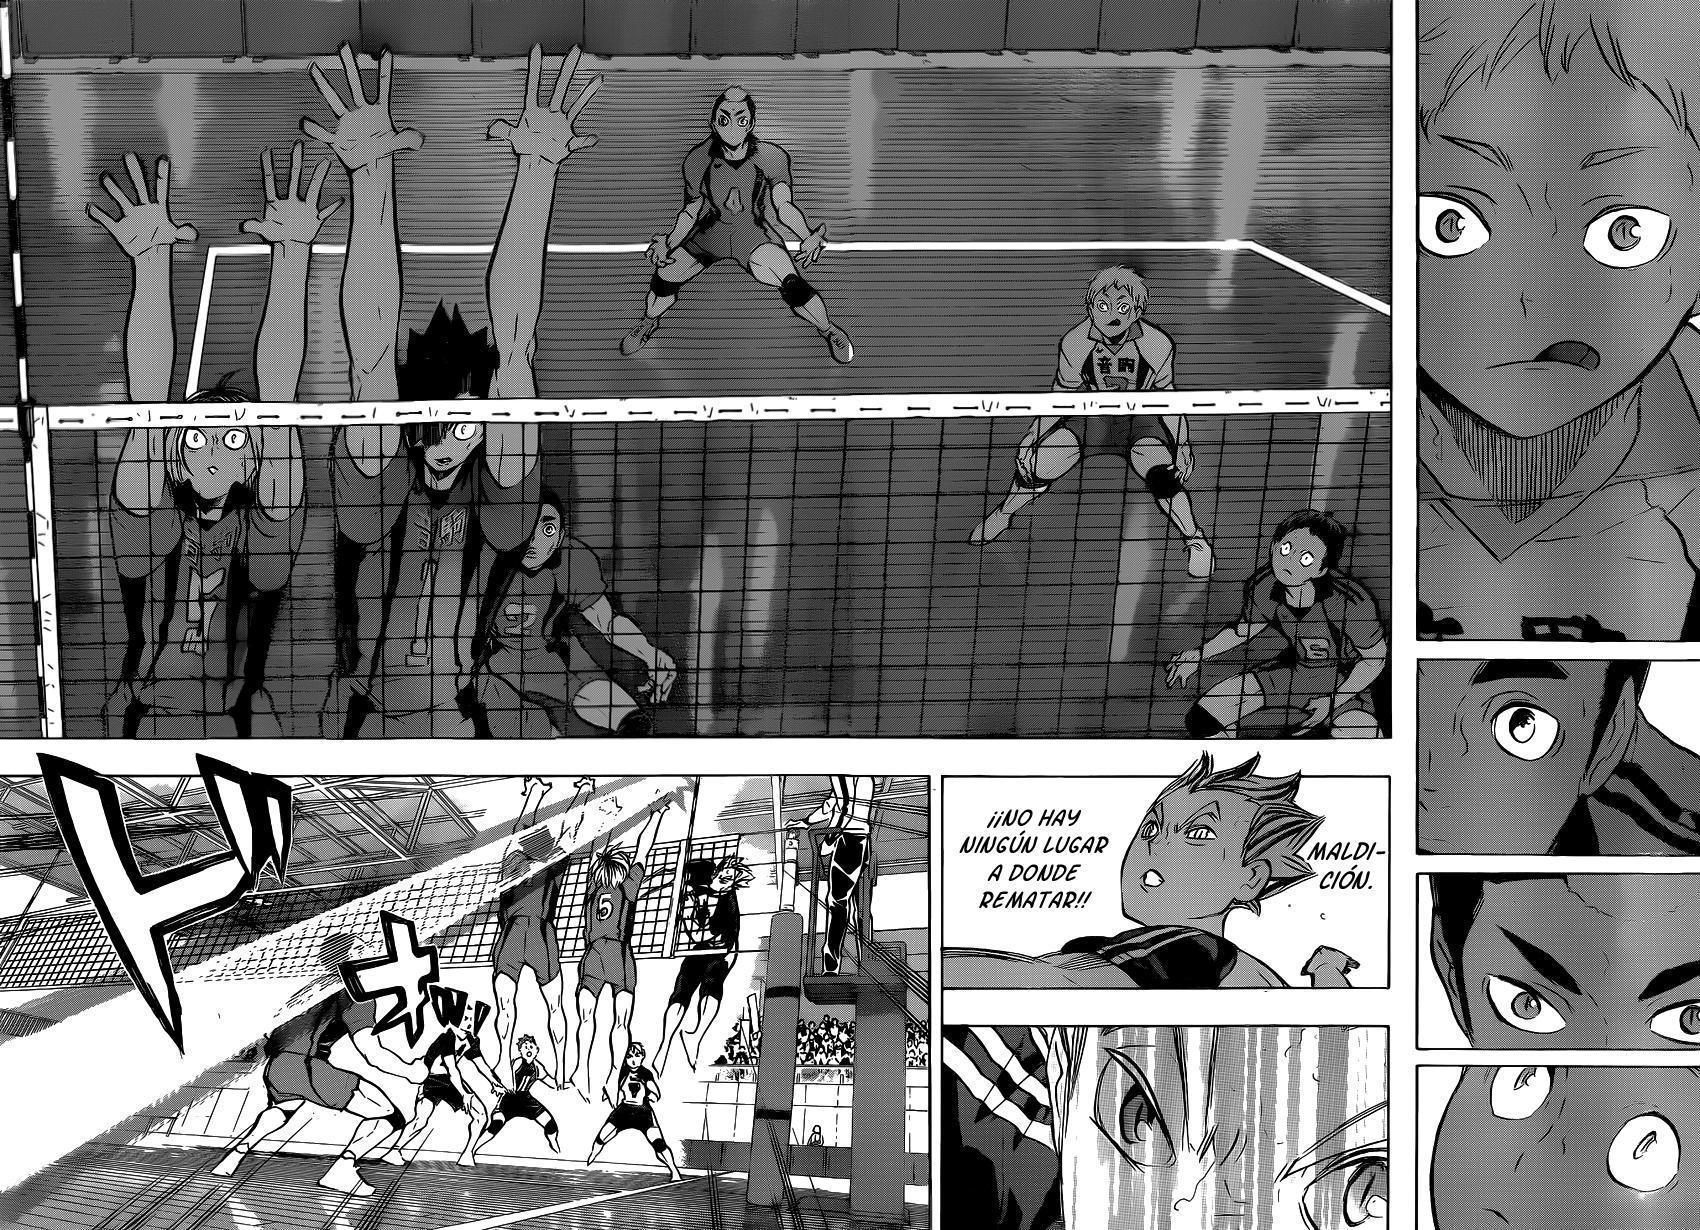 http://c5.ninemanga.com/es_manga/10/10/443566/8cba2025992666dcf229a5f783349b60.jpg Page 5